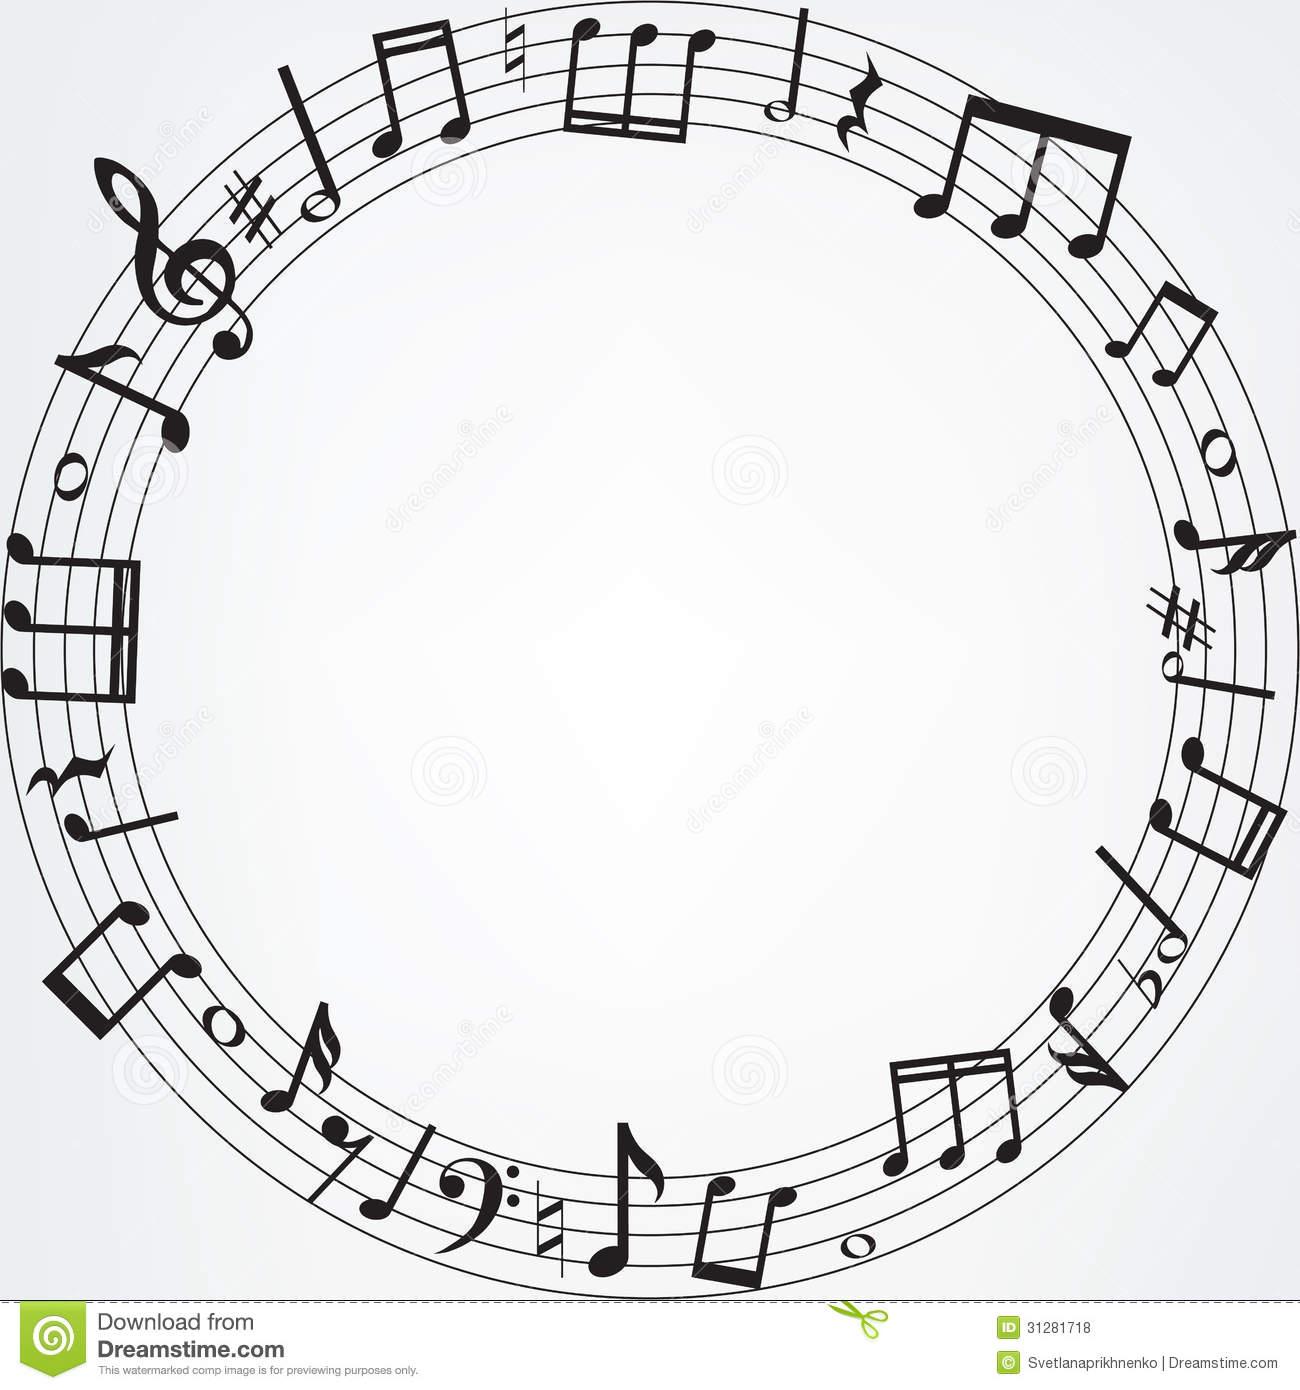 Free Download Music Note Wallpaper Border Weddingdressincom